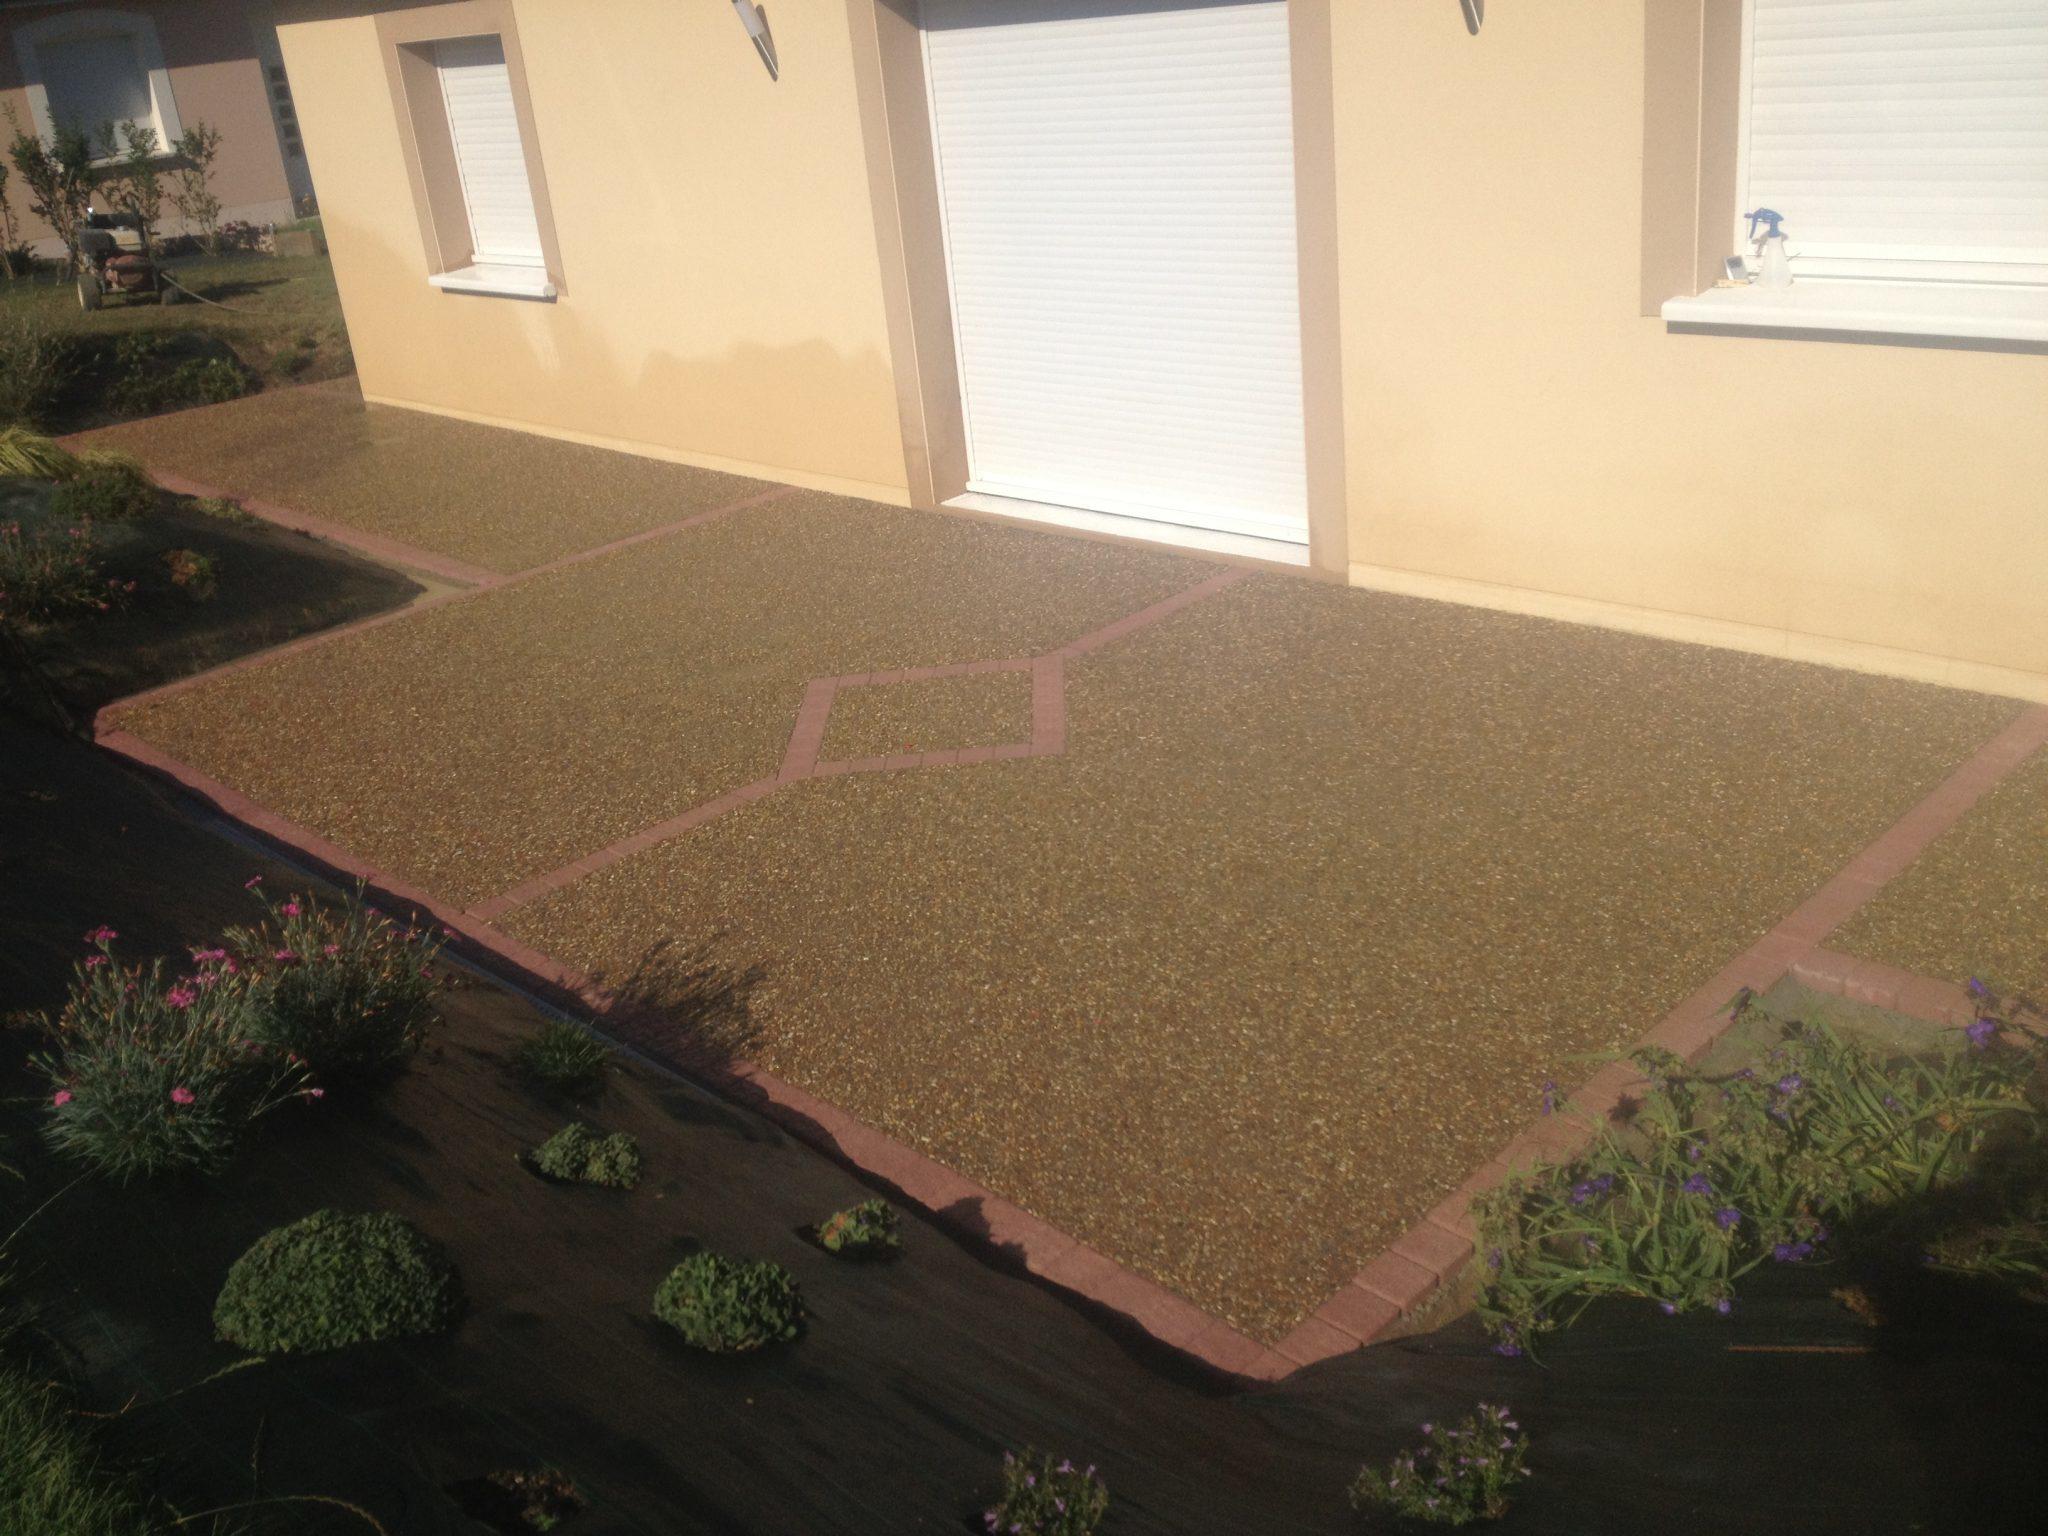 Ma onnerie g n rale laval mayenne sarl trouillard chesneau - Refection terrasse beton ...